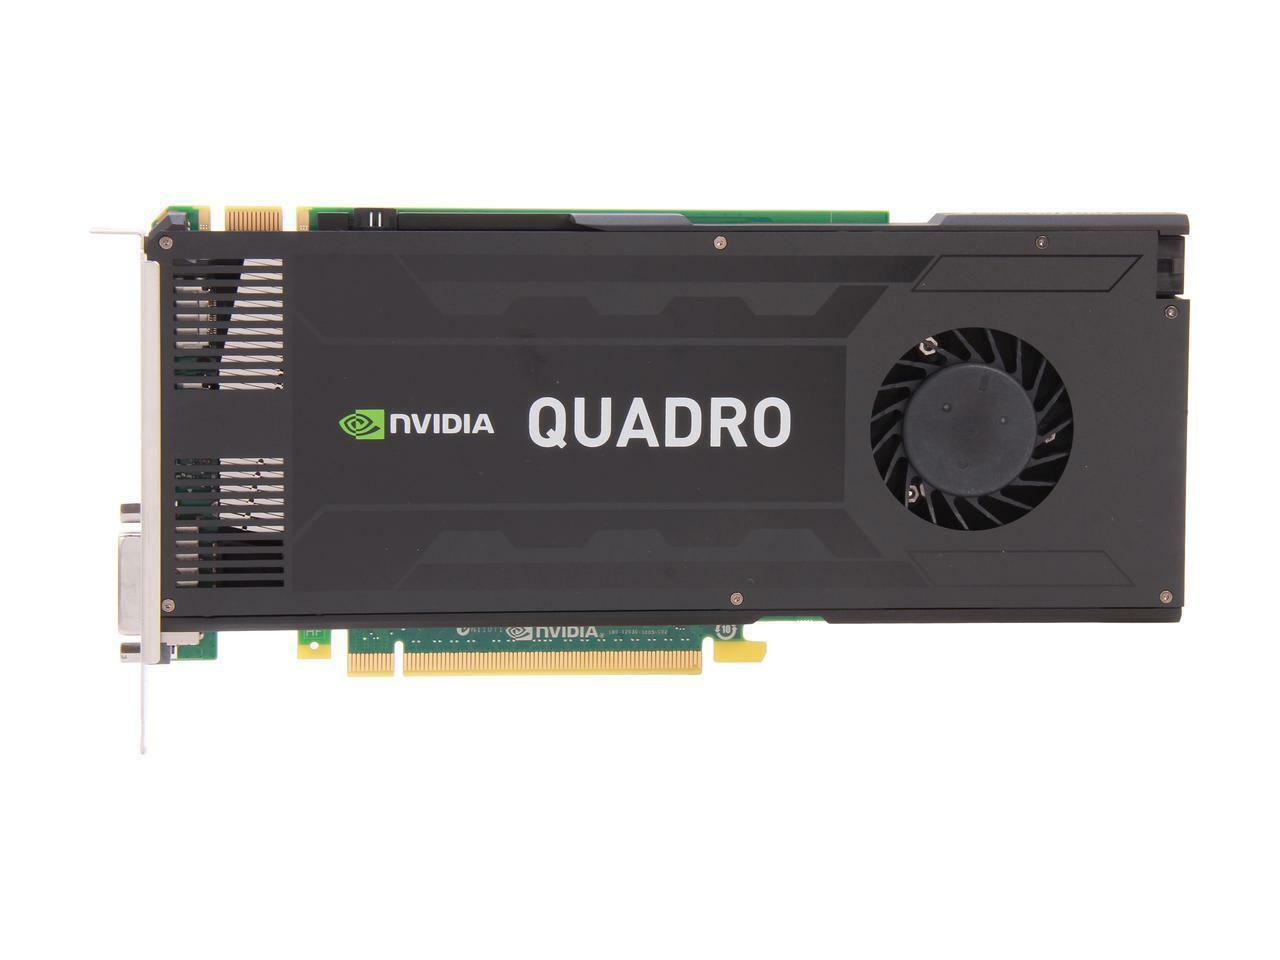 PNY NVIDIA Quadro K4200 4GB GDDR5 Video Card